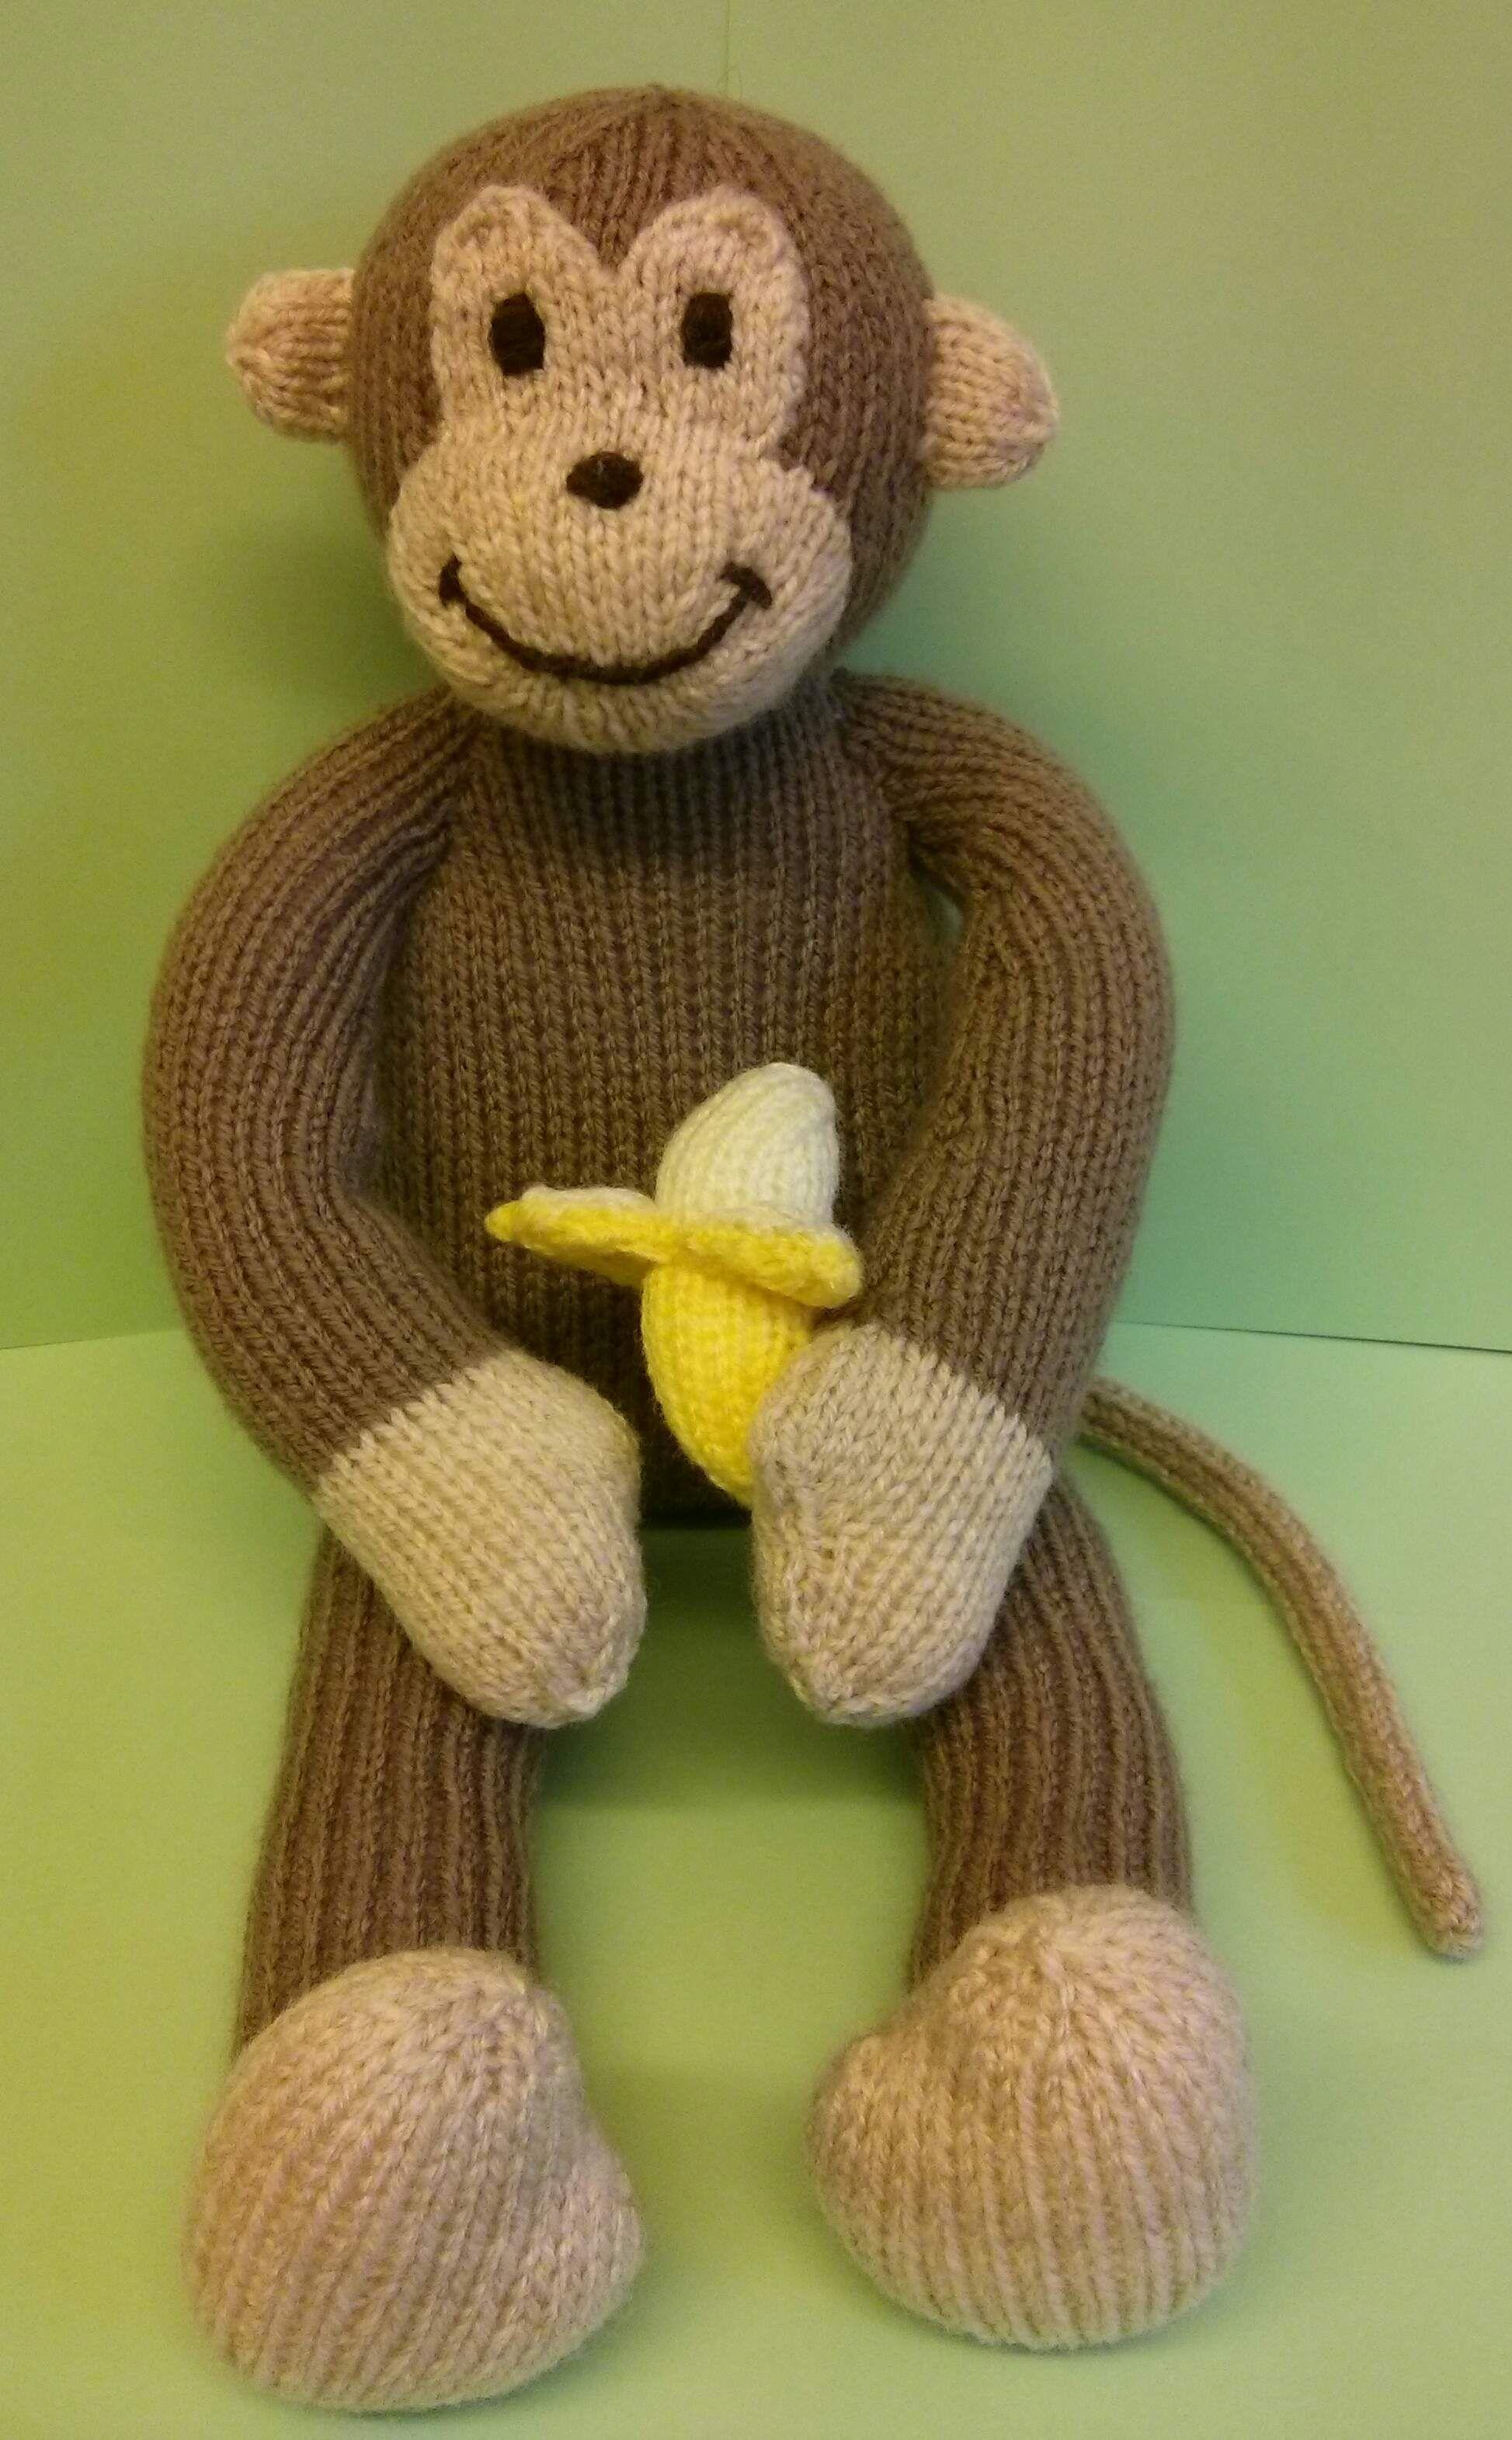 Knitted monkey sarah keen pattern knitted wild animals this knitted monkey sarah keen pattern knitted wild animals this pattern available free at bankloansurffo Gallery